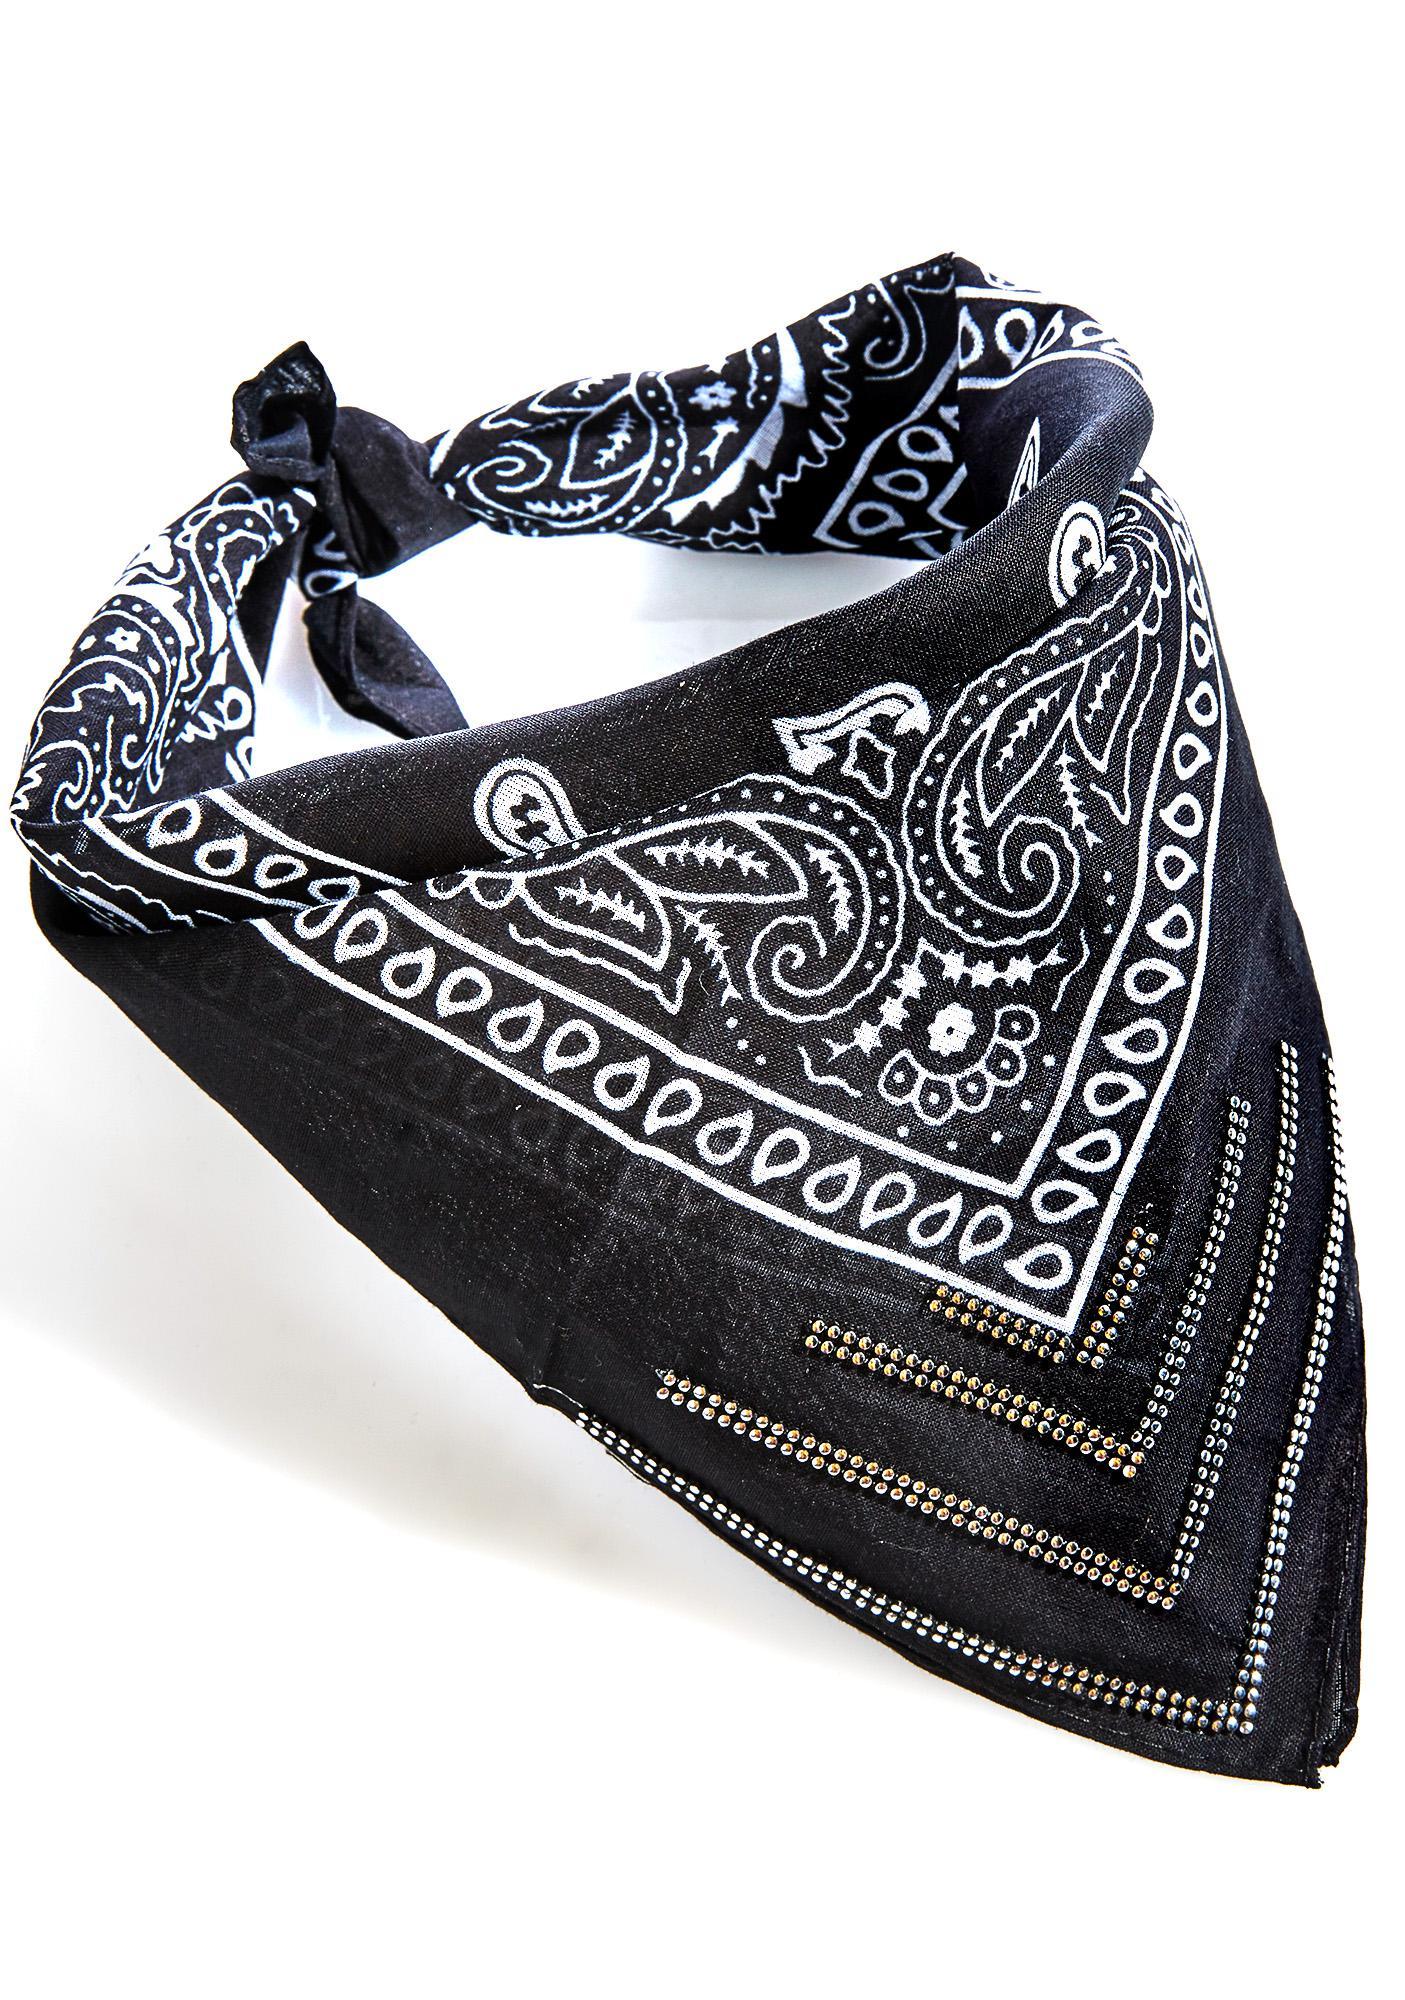 Onyx Studded Bandana